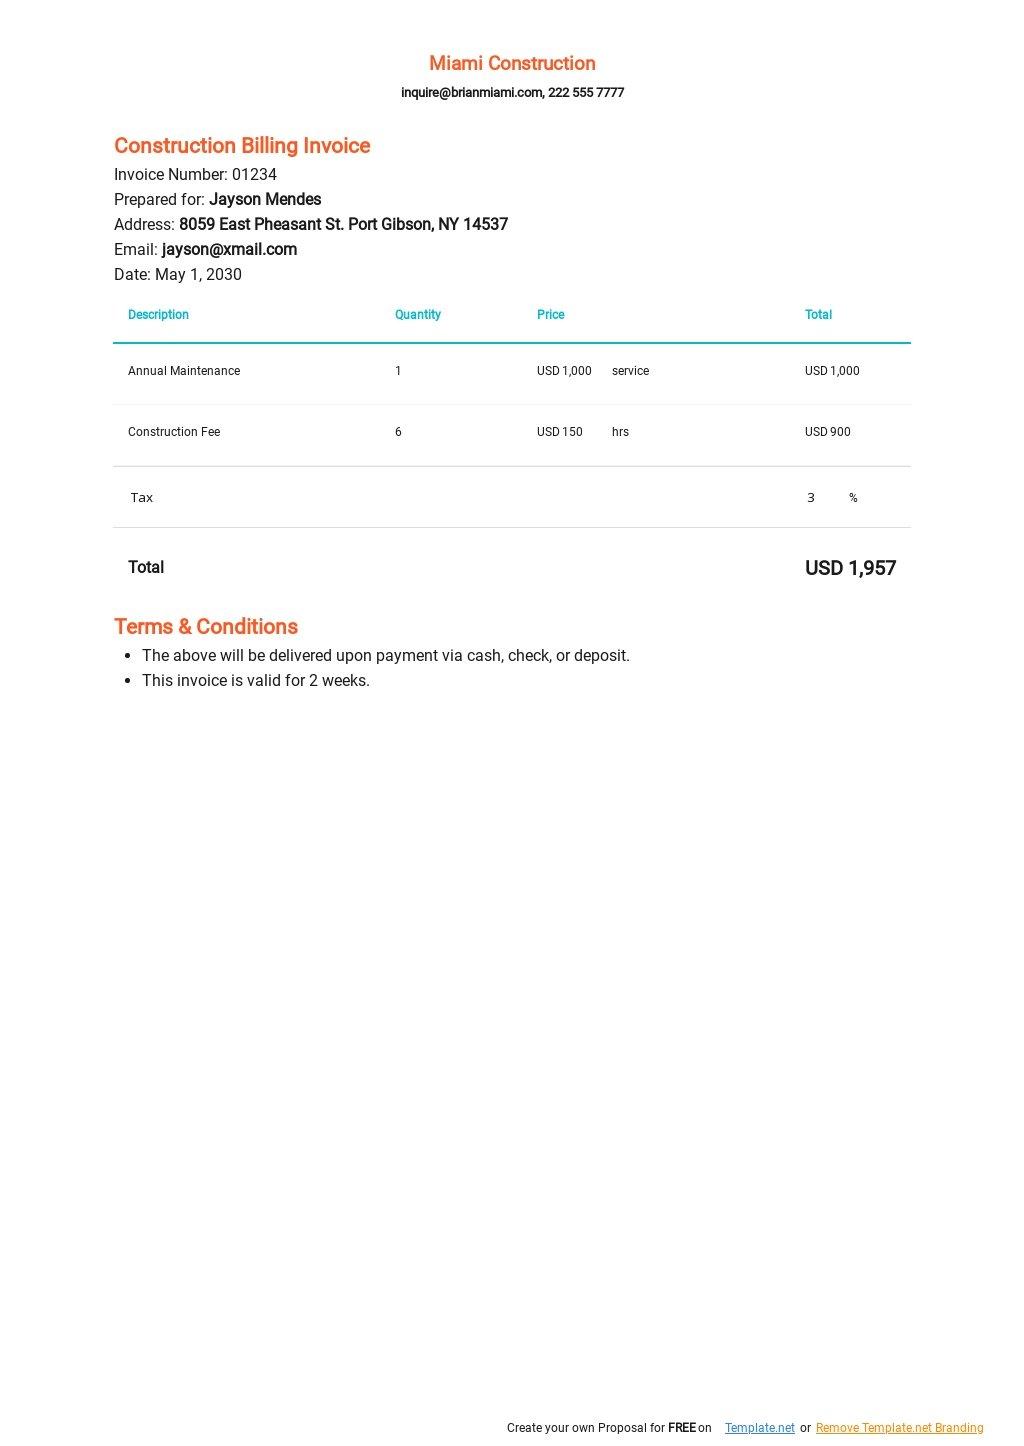 Construction Billing Invoice Template.jpe